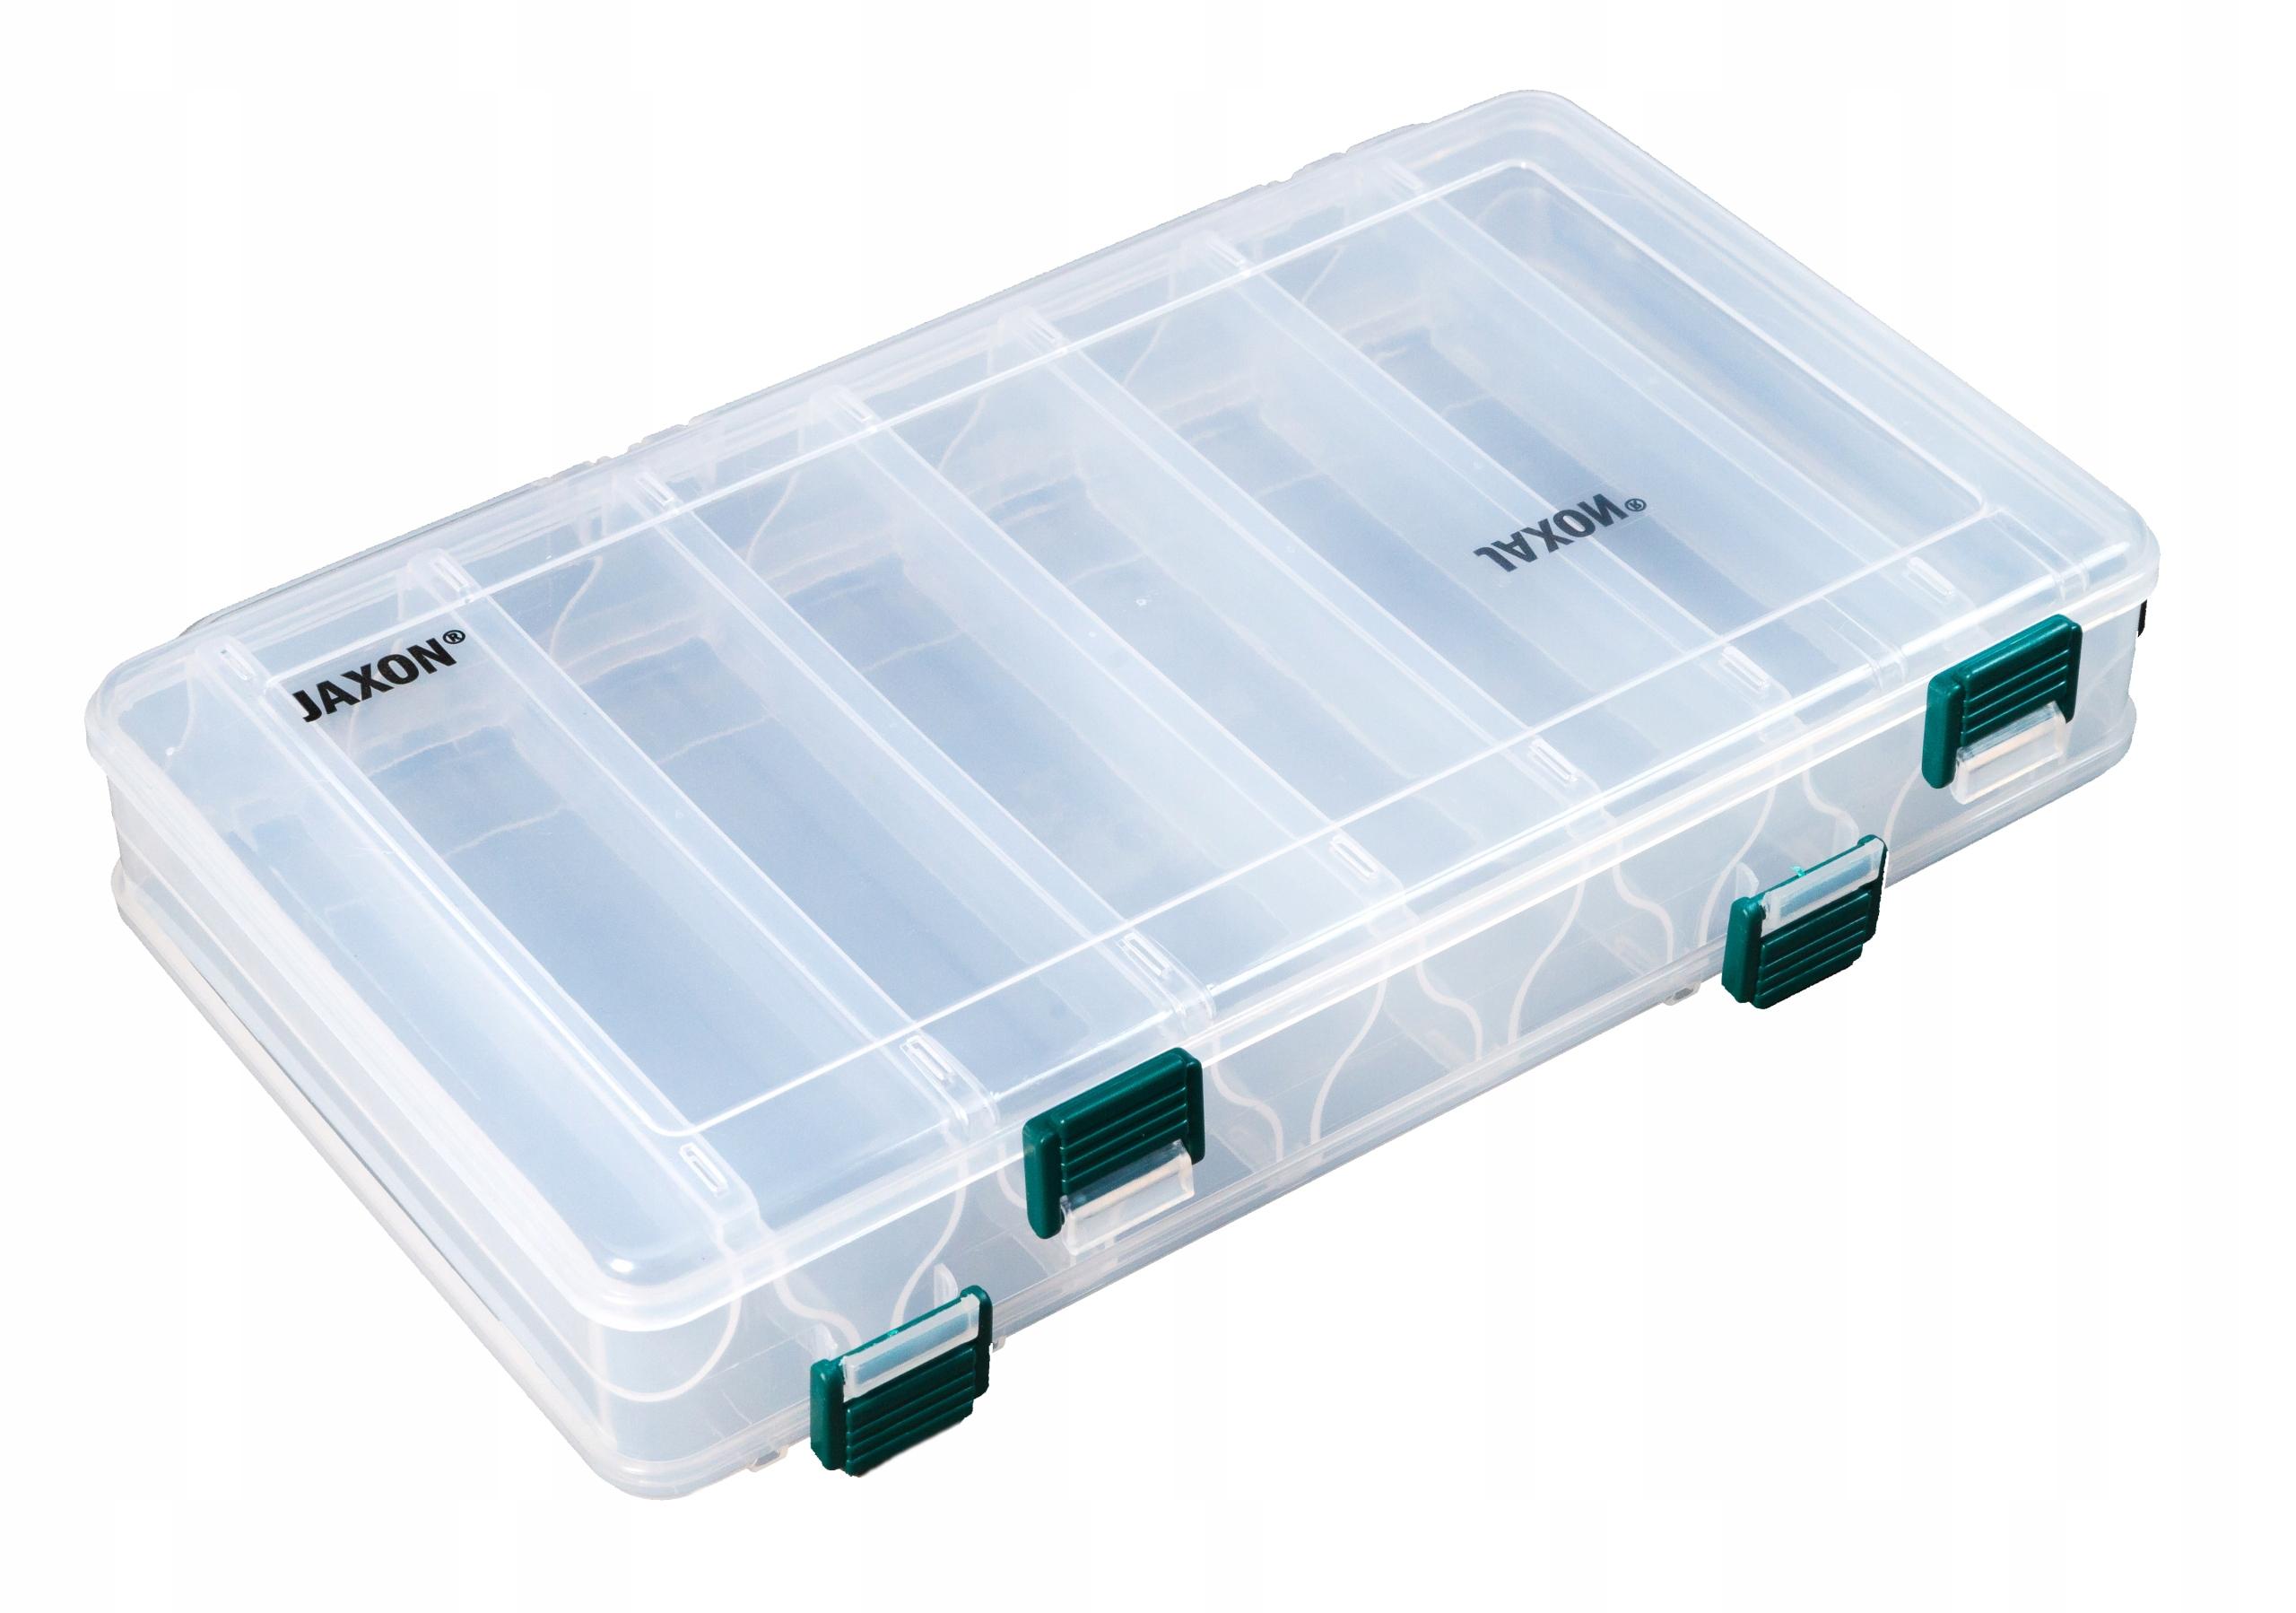 Rybárska box Jaxon 27x16x5 cm Wobbler RH-166